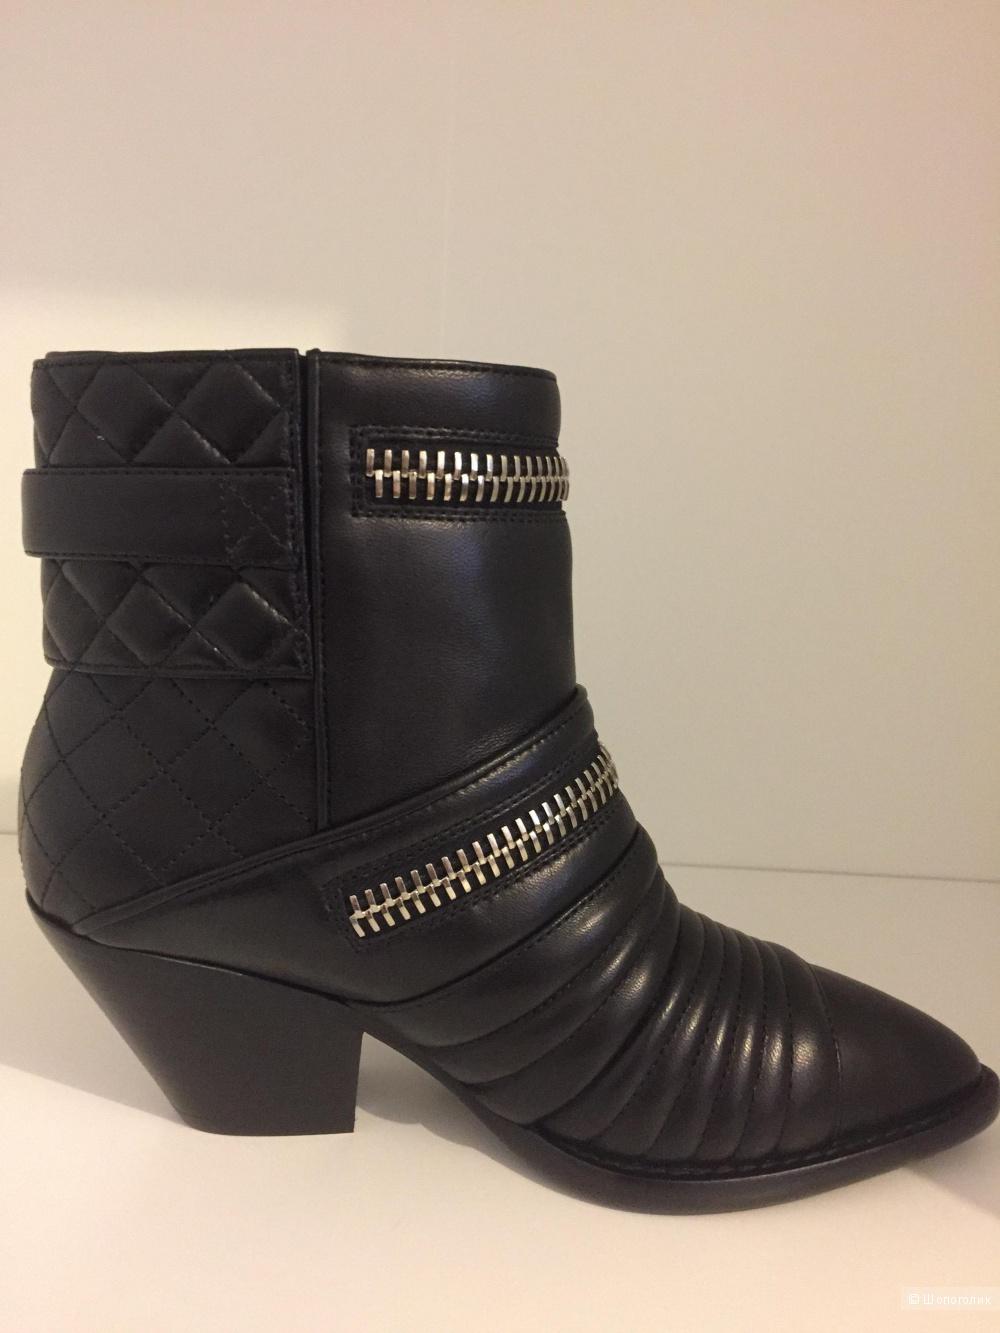 GIUSEPPE ZANOTTI DESIGN Ankle Boots демисезонные сапоги 37 размер